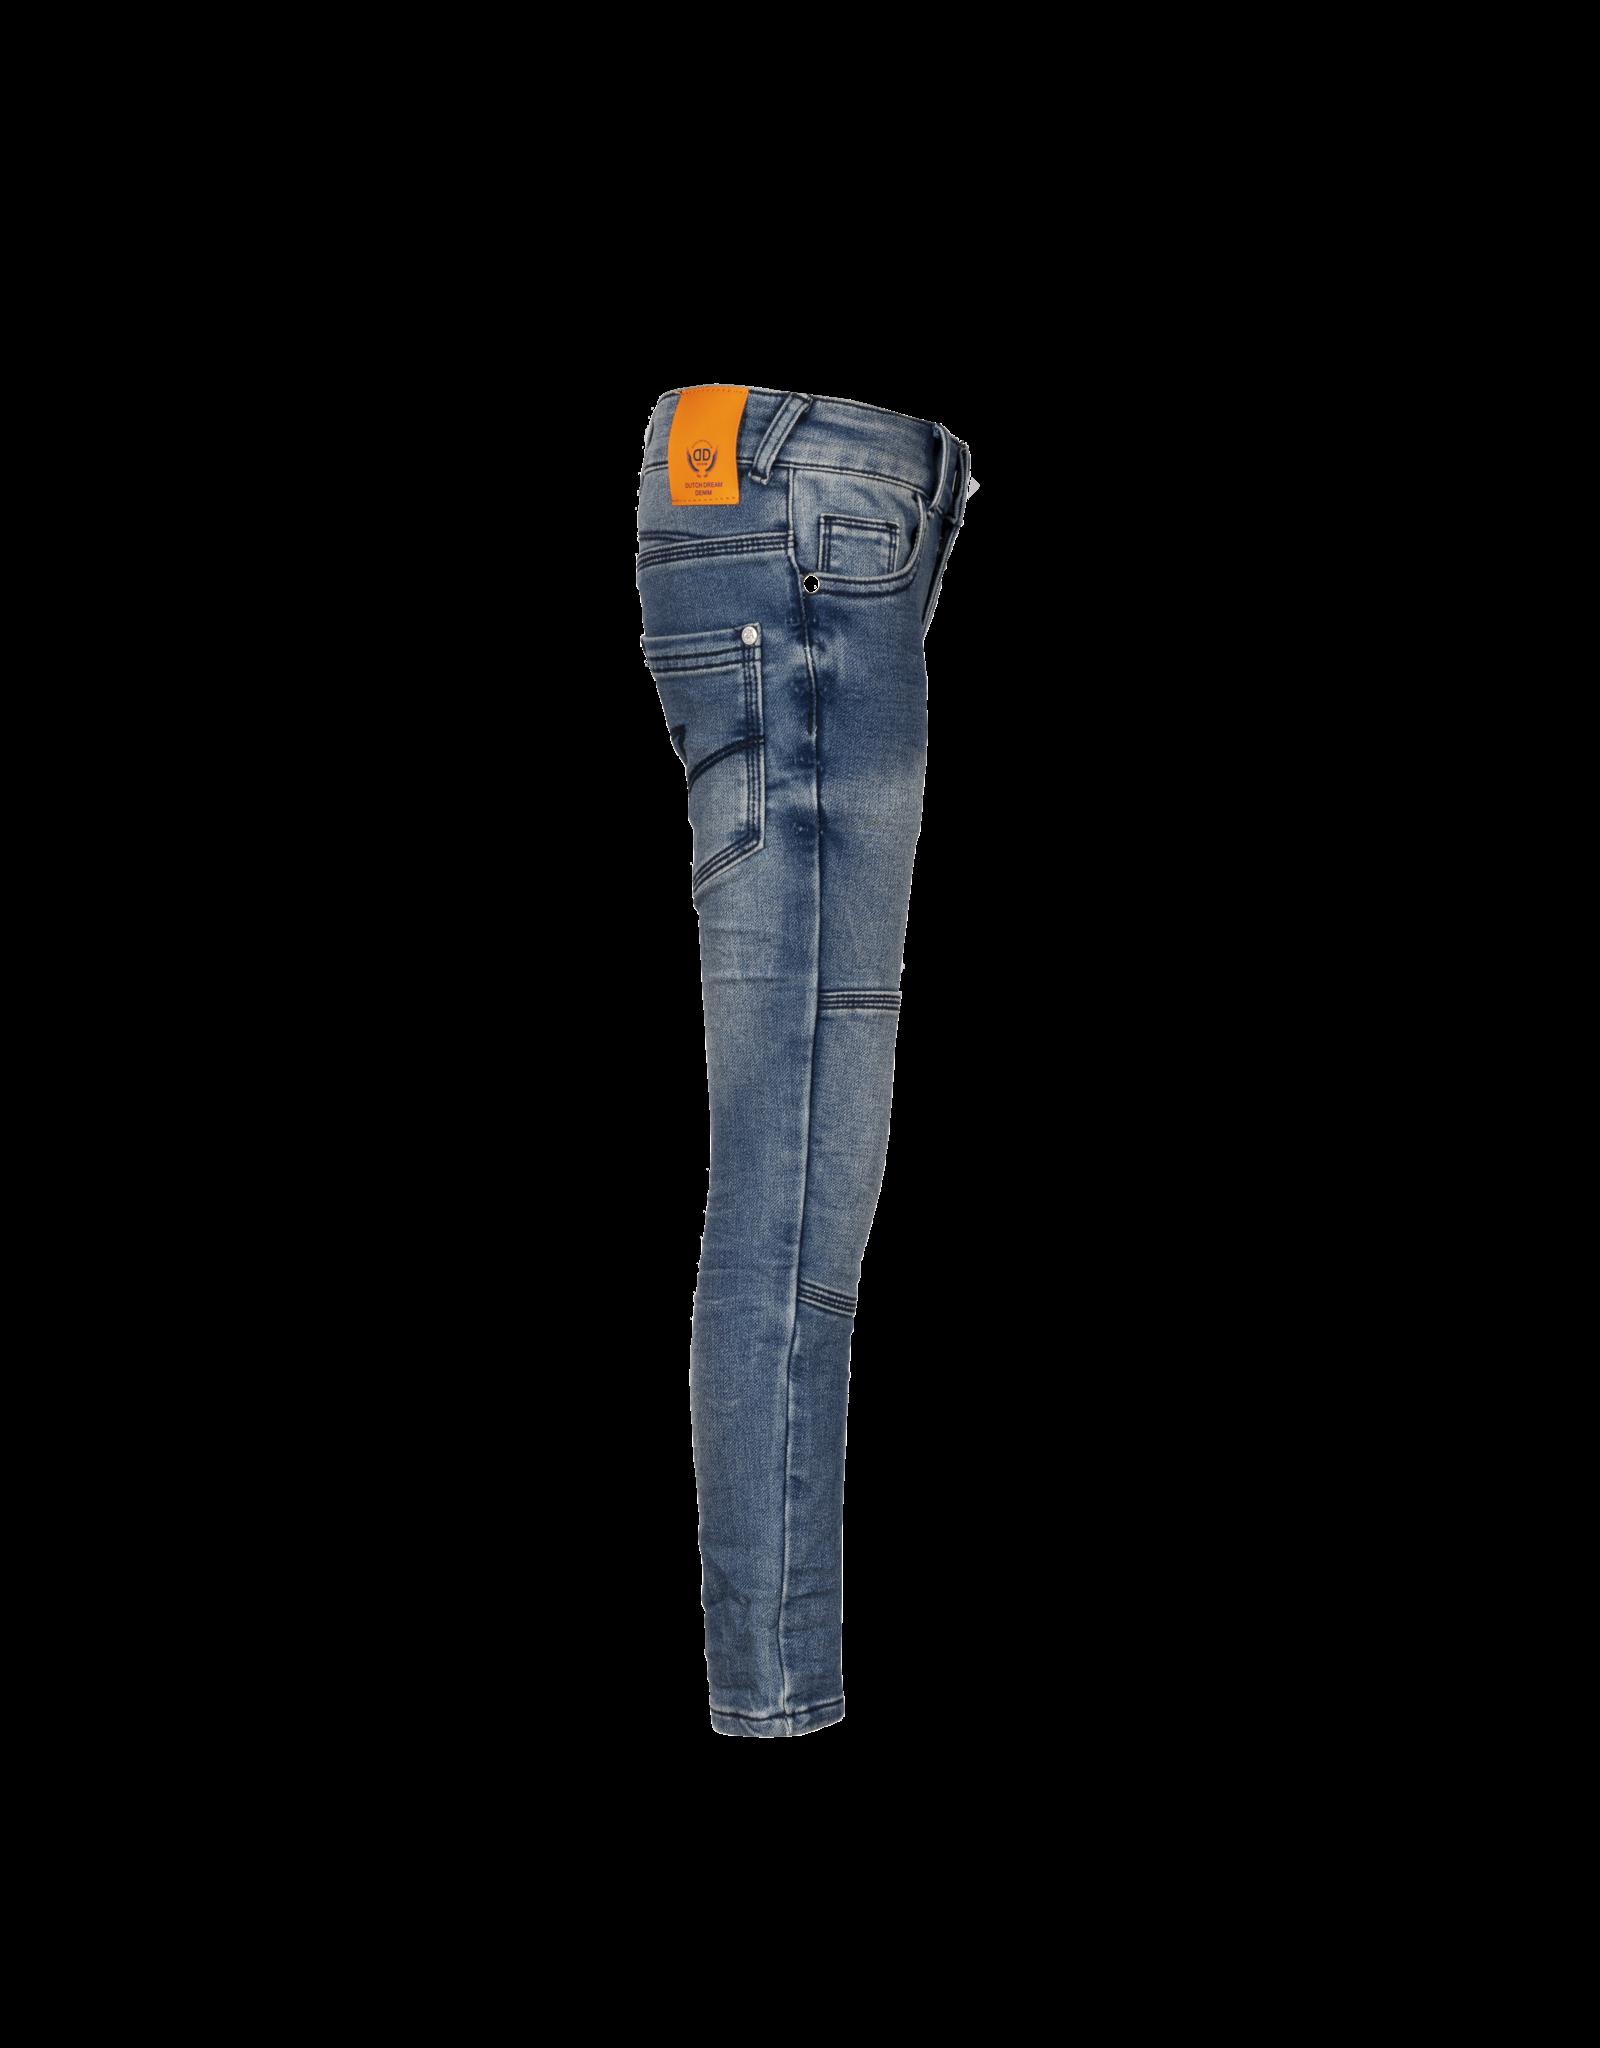 Dutch dream denim ZILE, EXTRA SLIM FIT Jogg jeans met dubbele laag stof op de knieën